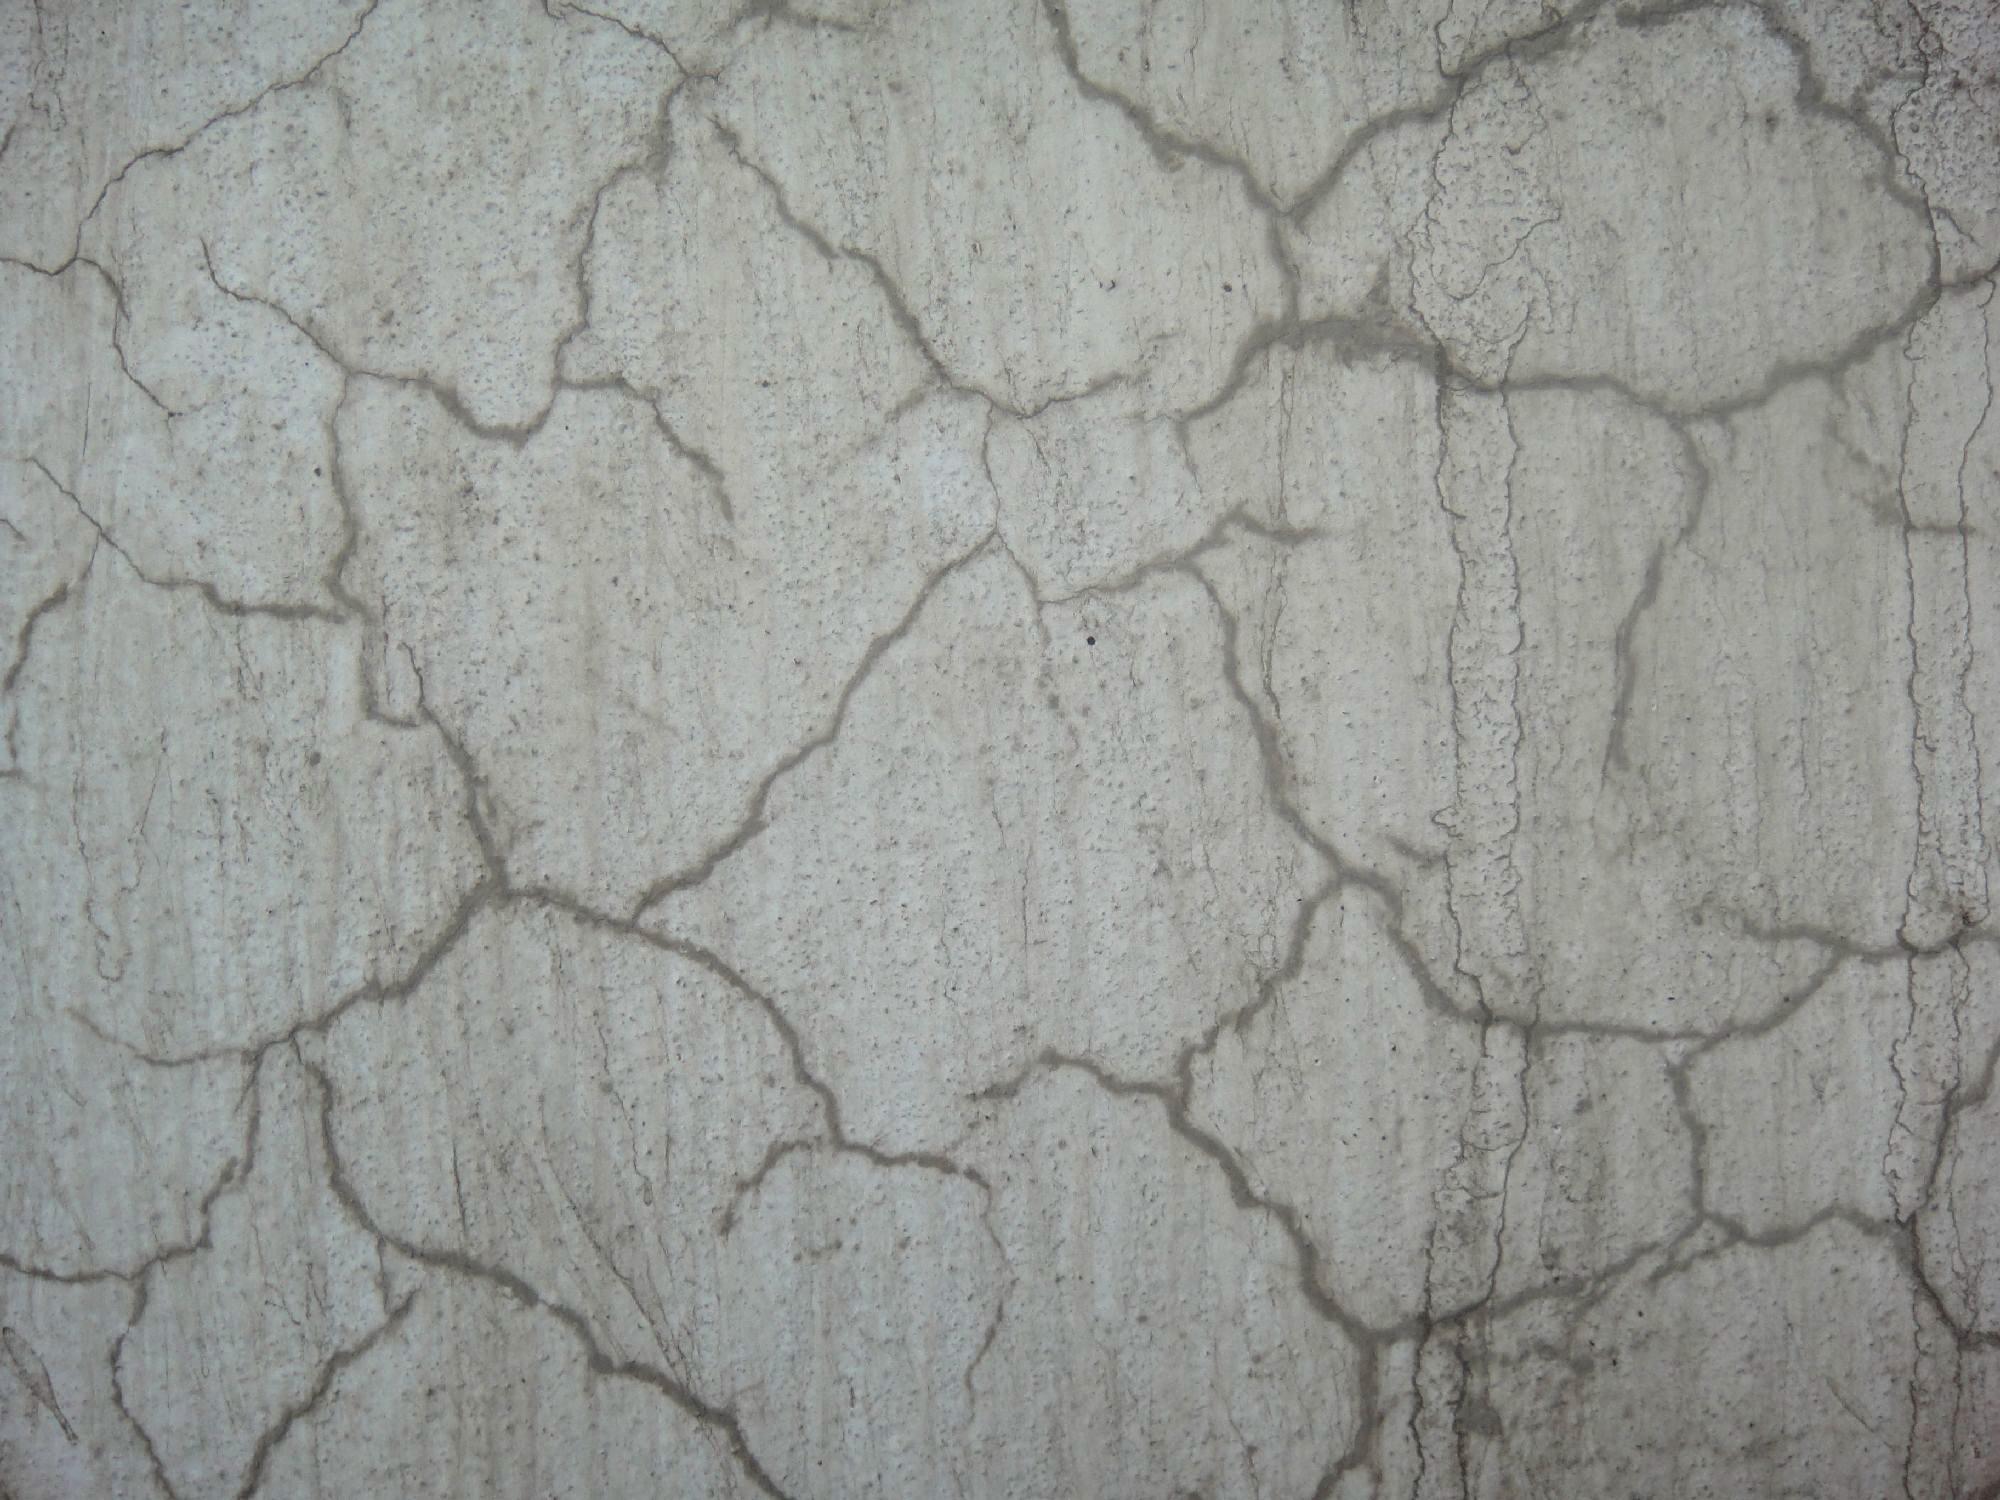 Dirt white paint patches, Antique, Messy, Used, Unique, HQ Photo